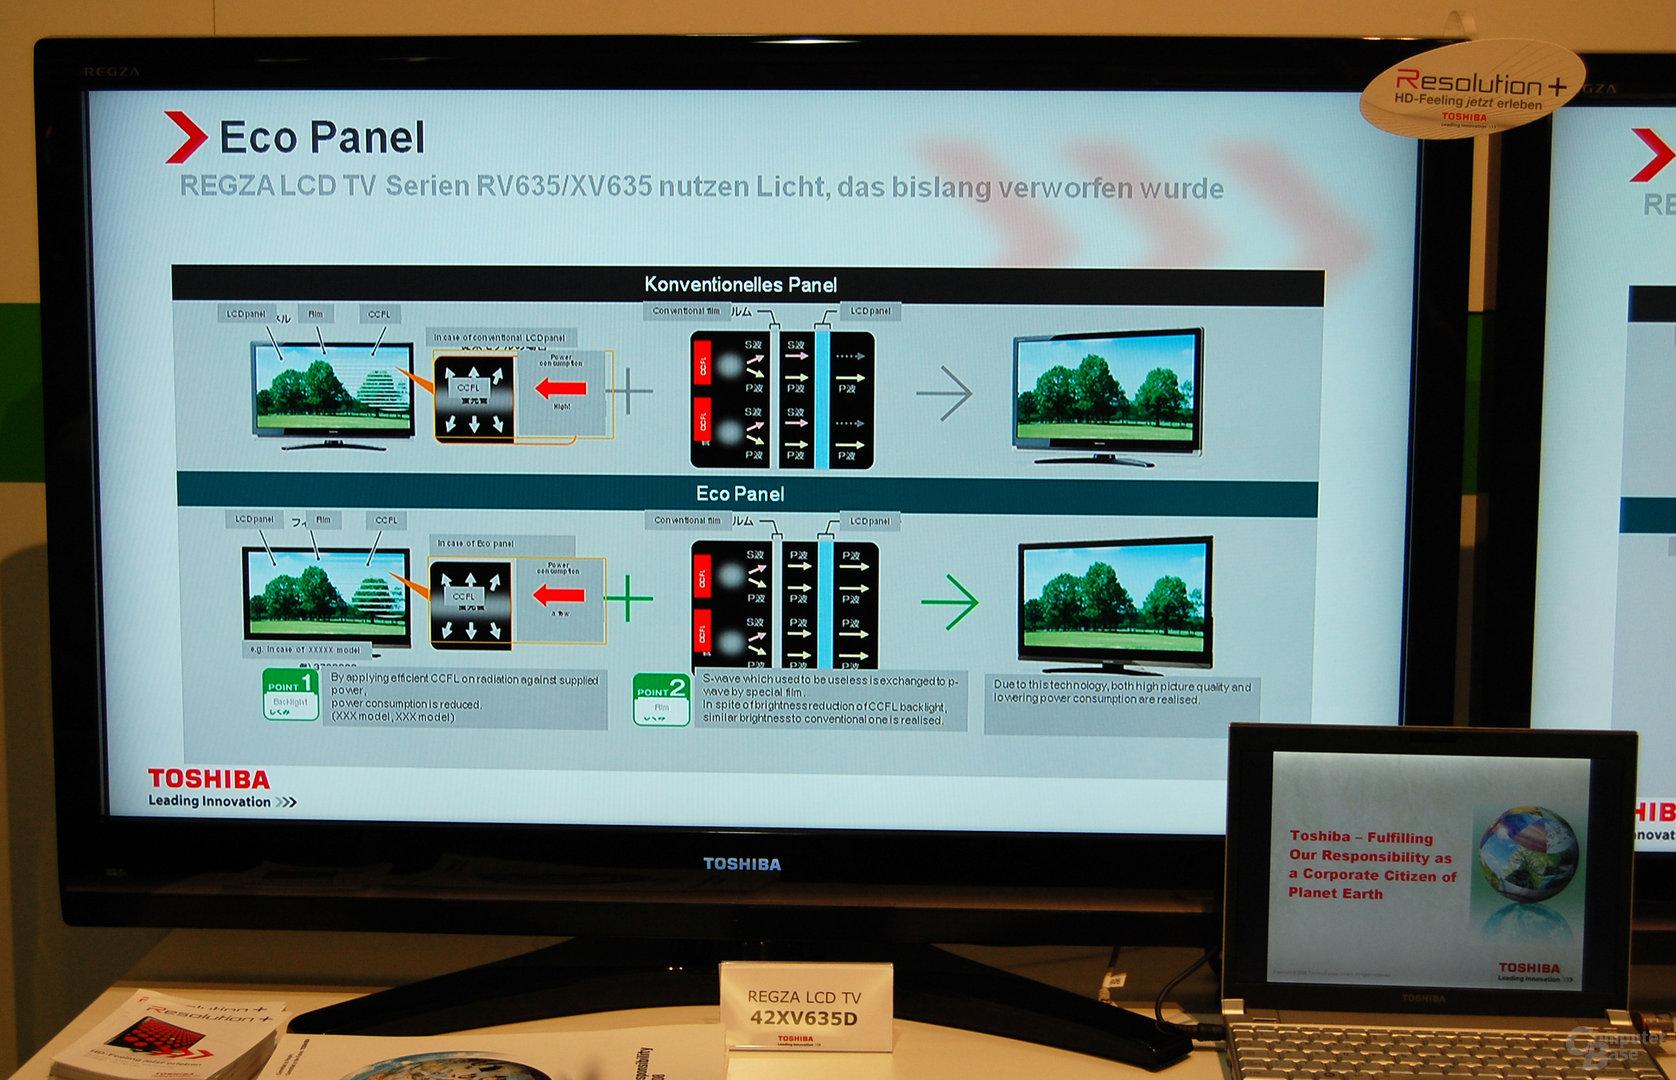 Toshibas Eco-TVs 42RV635D und 42XV635D